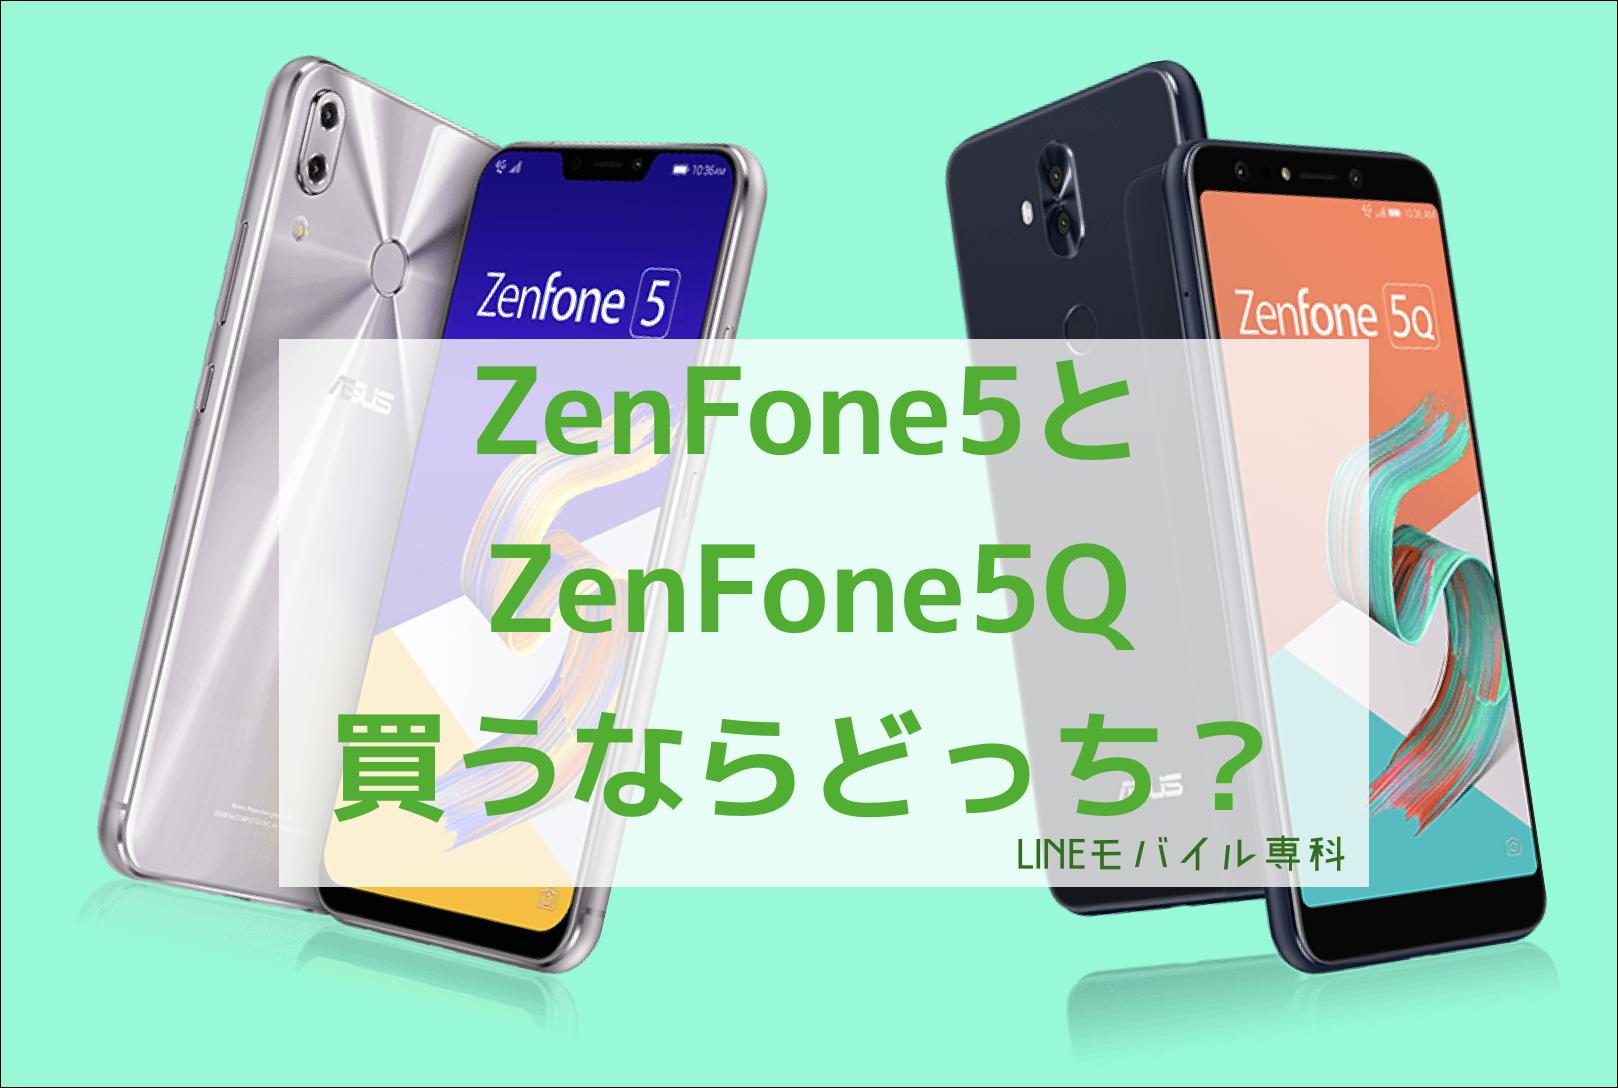 ZenFone5とZenFone5Q買うならどっち?